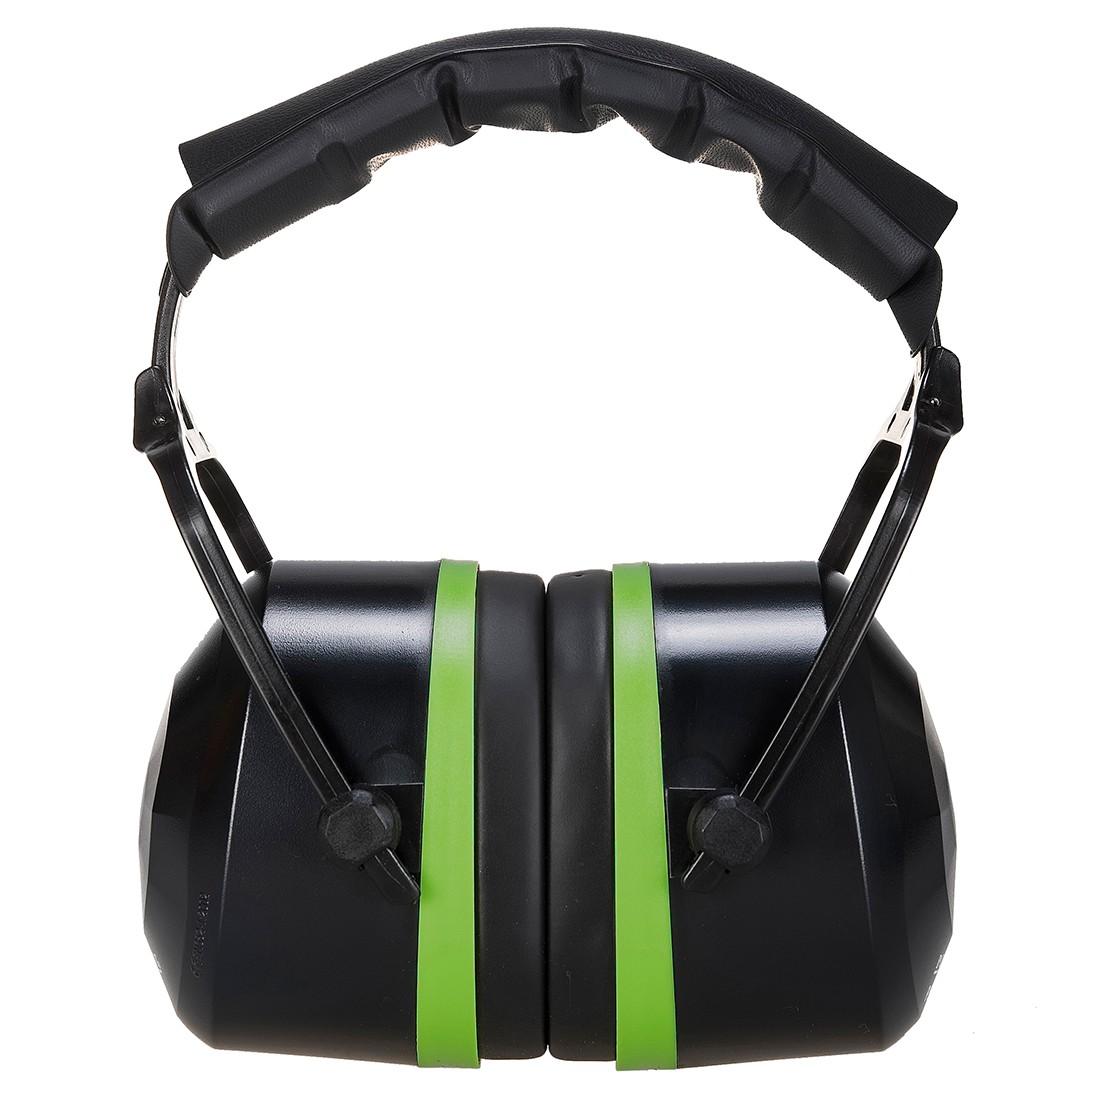 Casti Antifonare Top Ear - Echipamente de protectie personala